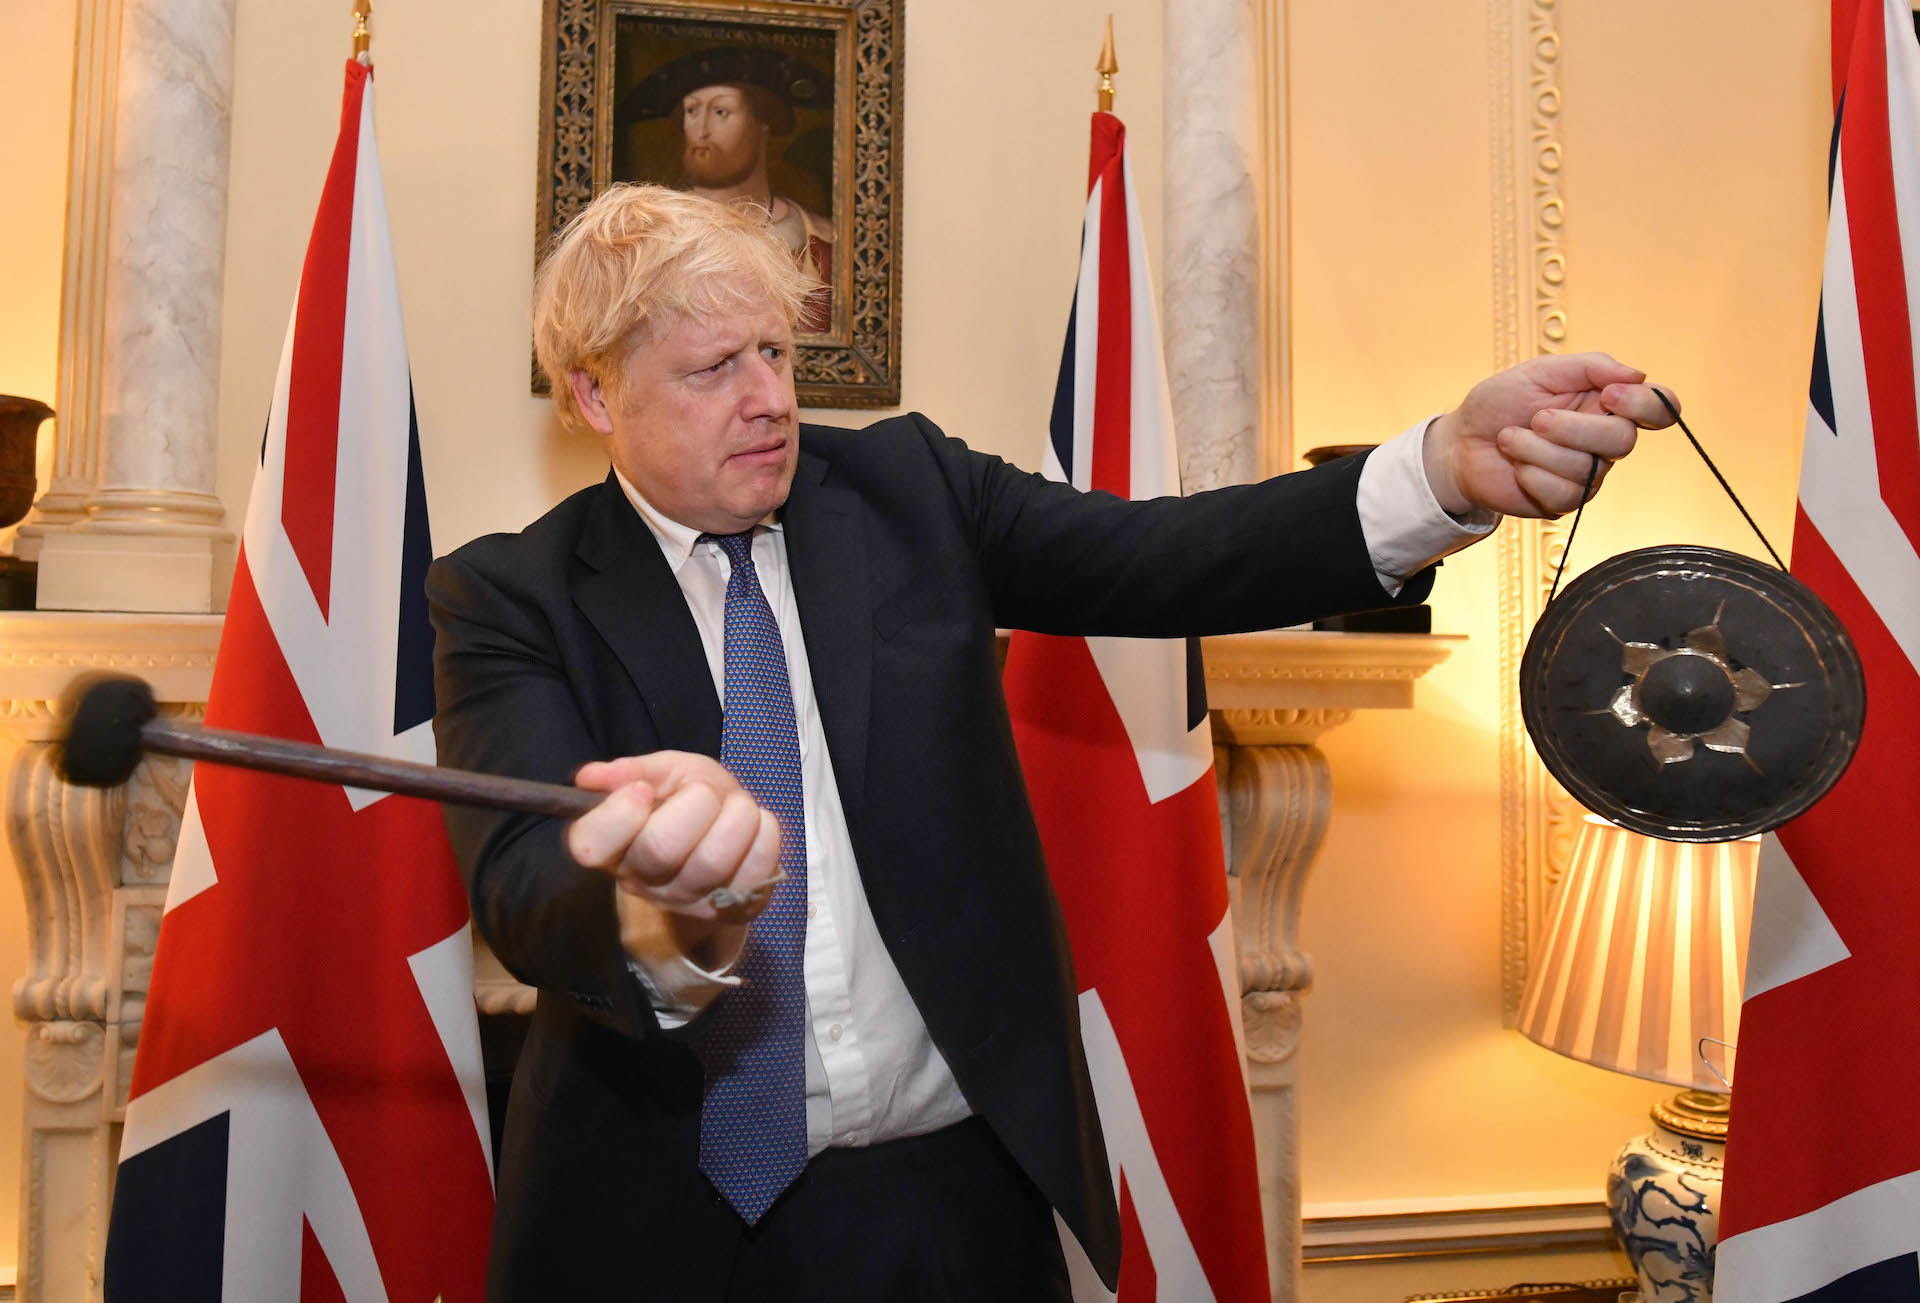 Boris Johnson 在2020年1月31日脫歐前夕在唐寧街敲小銅鑼(圖/Number 10/CC BY-NC-ND 2.0)